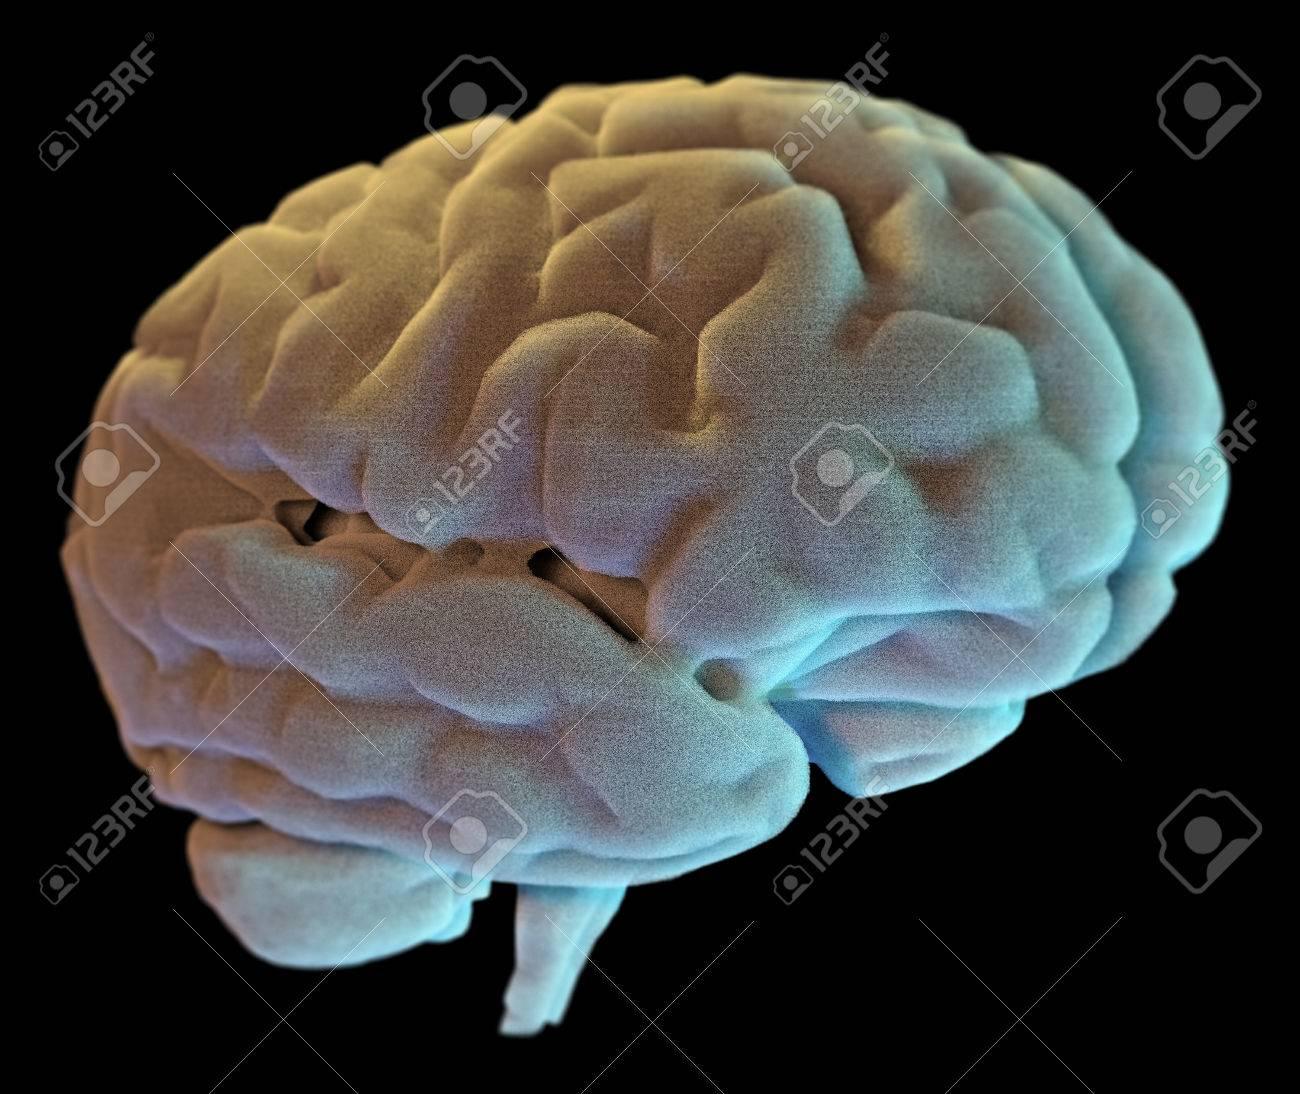 Gehirnneuronen Synapse, Anatomie Körper, Studium, Krankheit ...